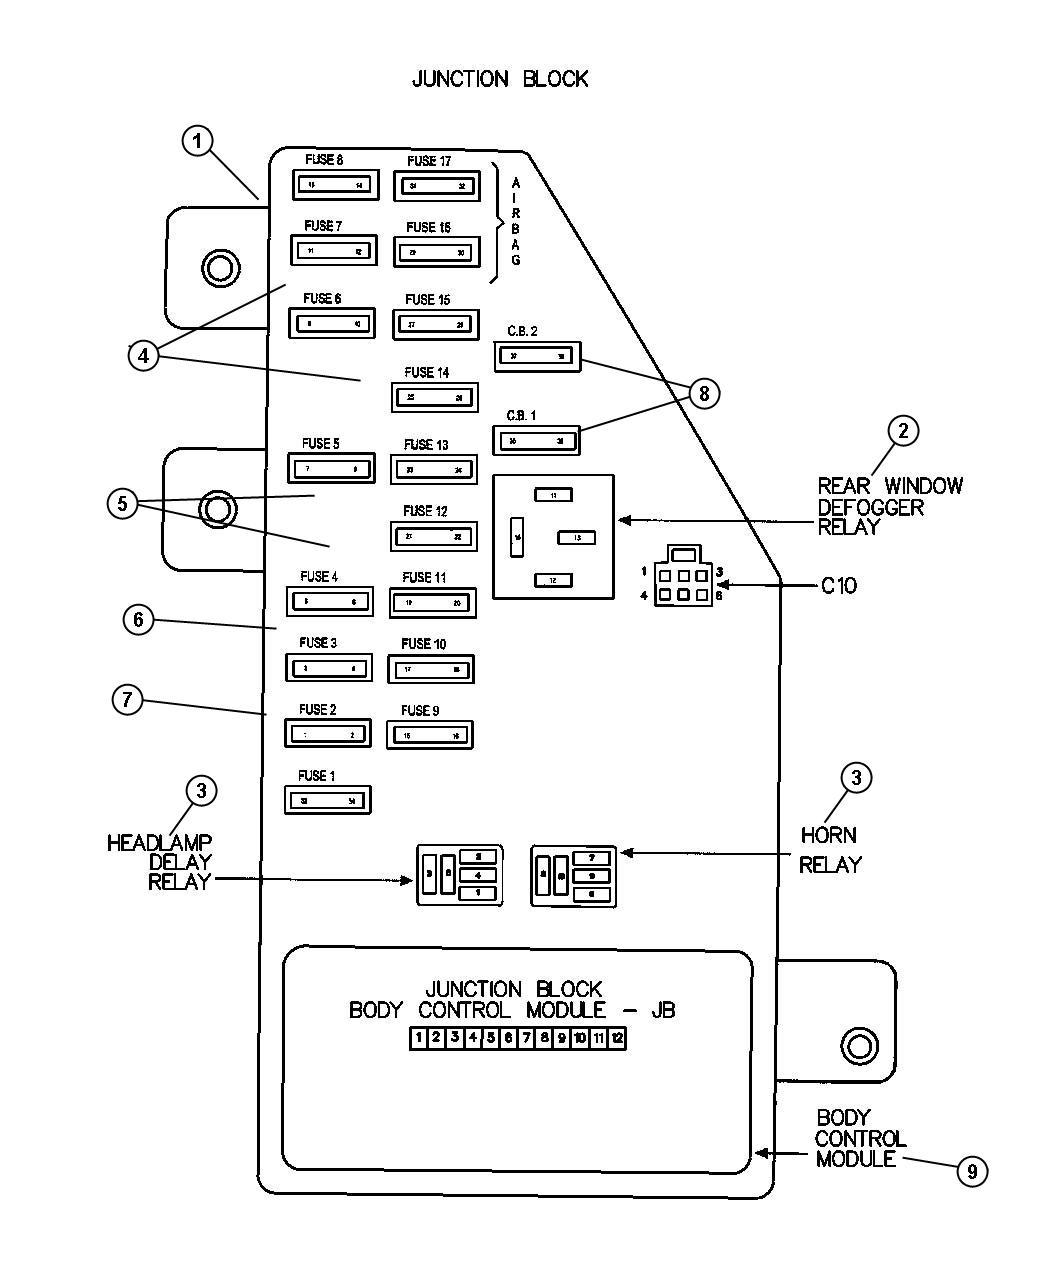 2002 sebring fuse box diagram rv 4570  box additionally 2005 dodge magnum fuse box diagram on  2005 dodge magnum fuse box diagram